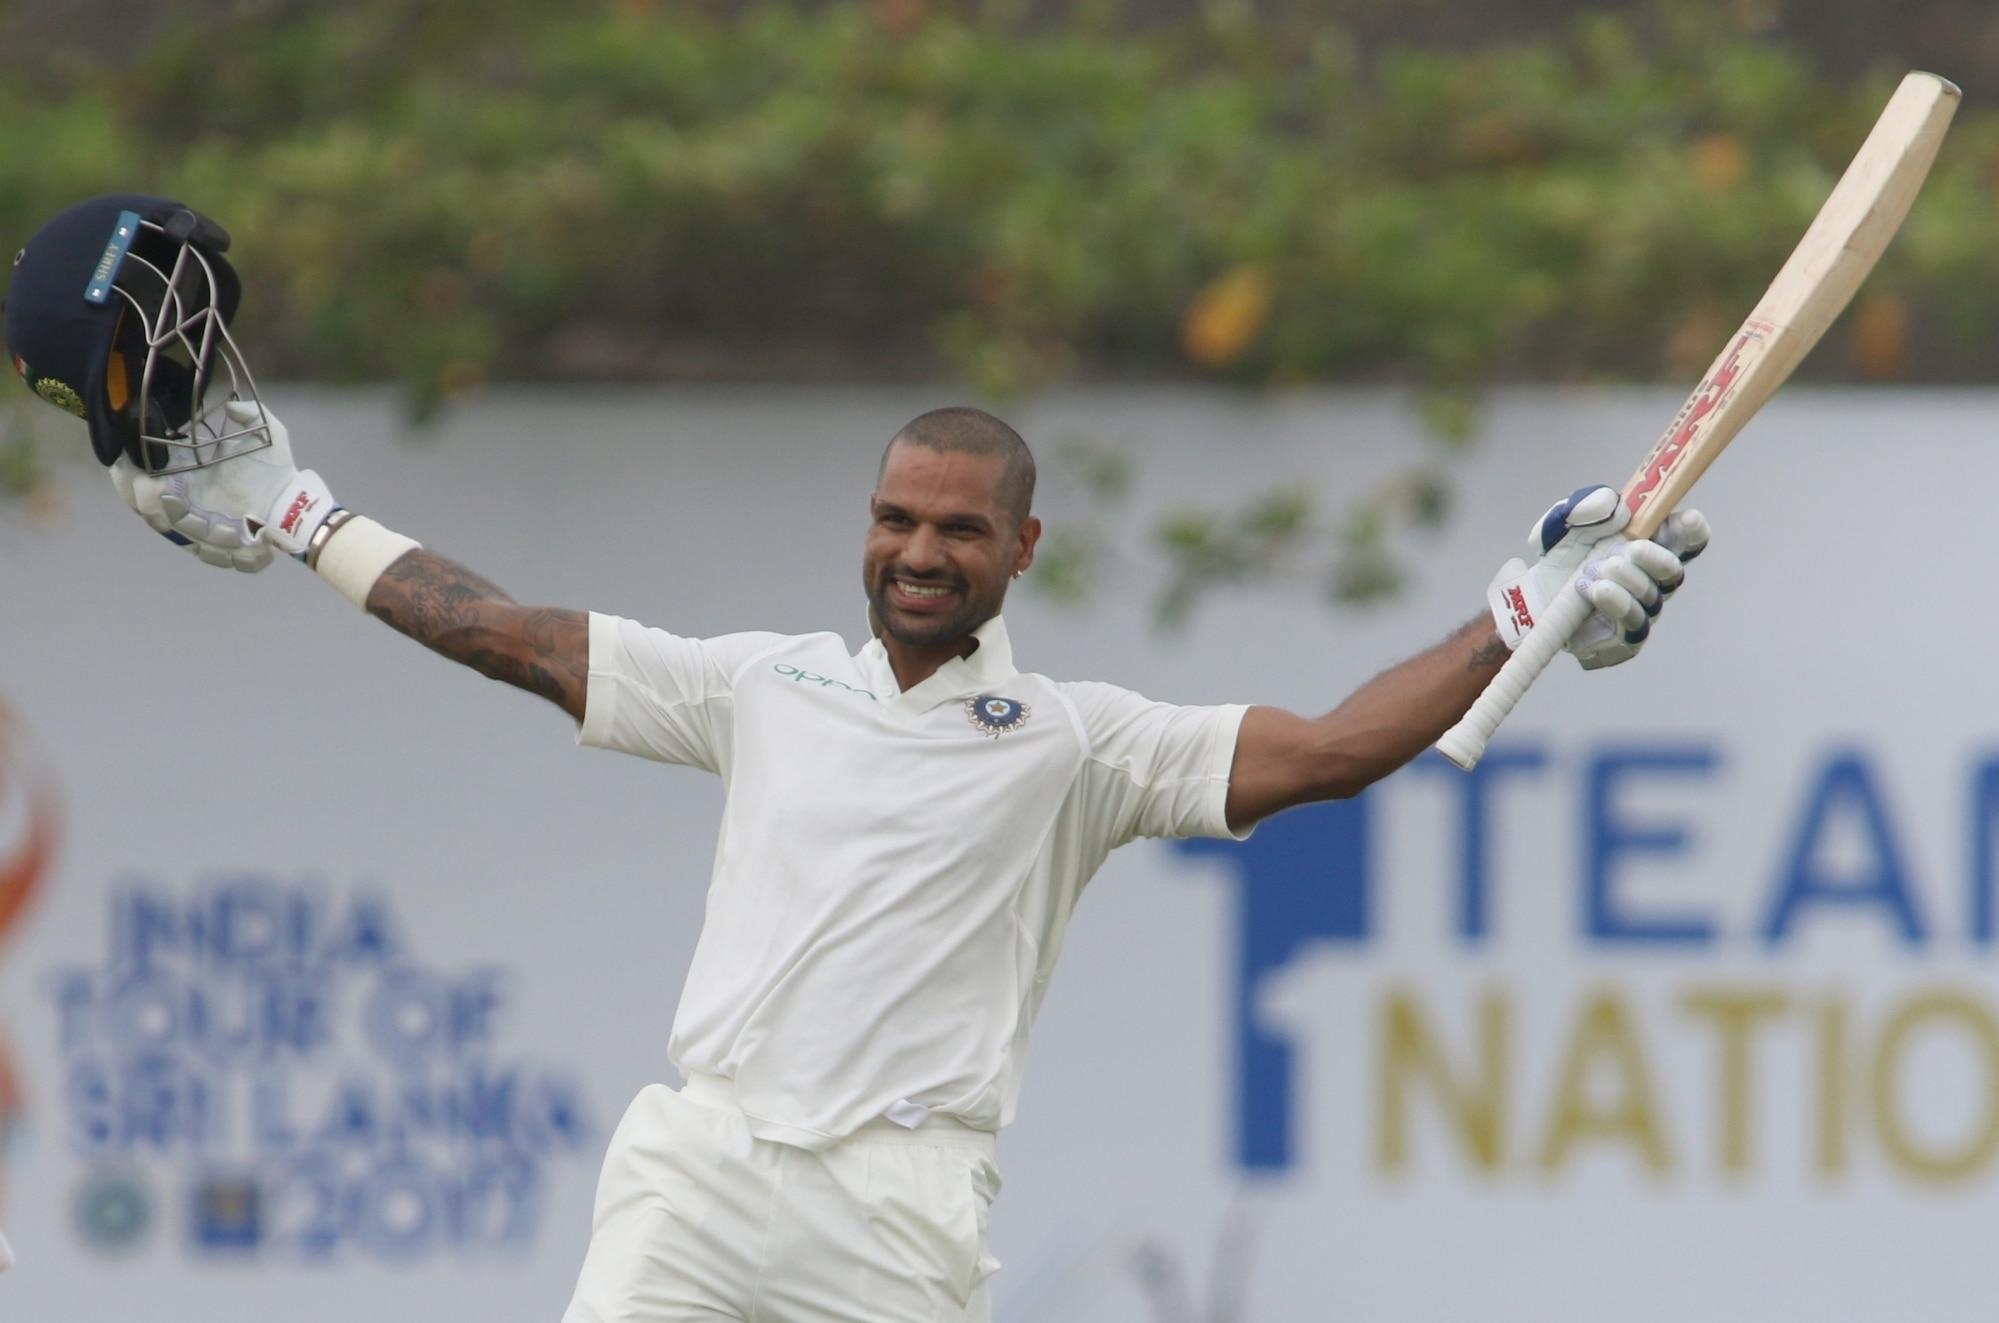 India vs Sri Lanka 1st Test 2017: Shikhar Dhawan, Cheteshwar Pujara Shine as Visitors Take Honours on Day 1